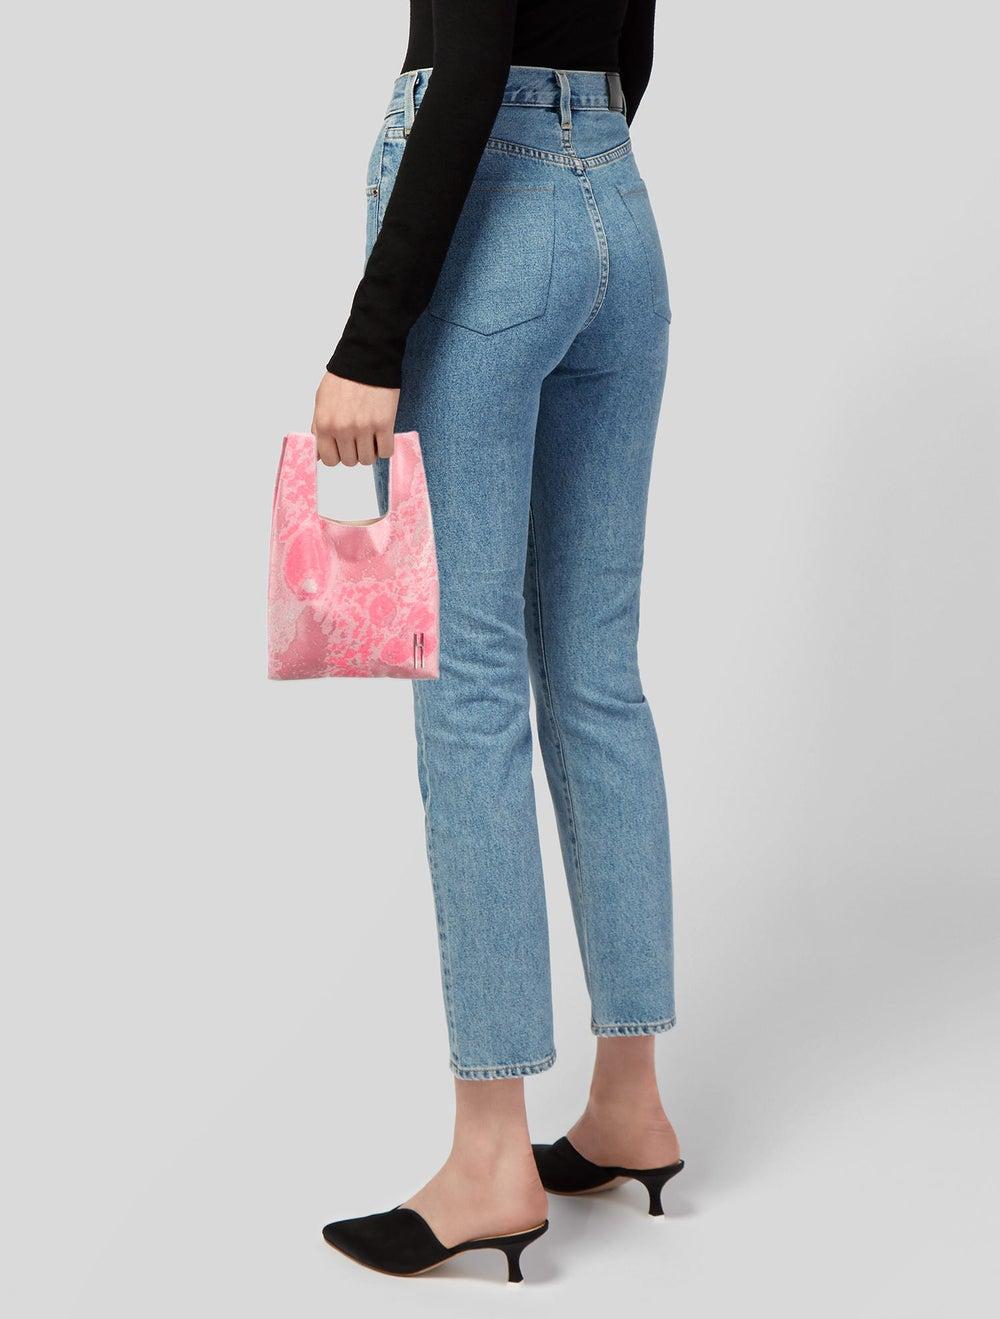 Hayward Floral Brocade Mini Shopper Pink - image 2